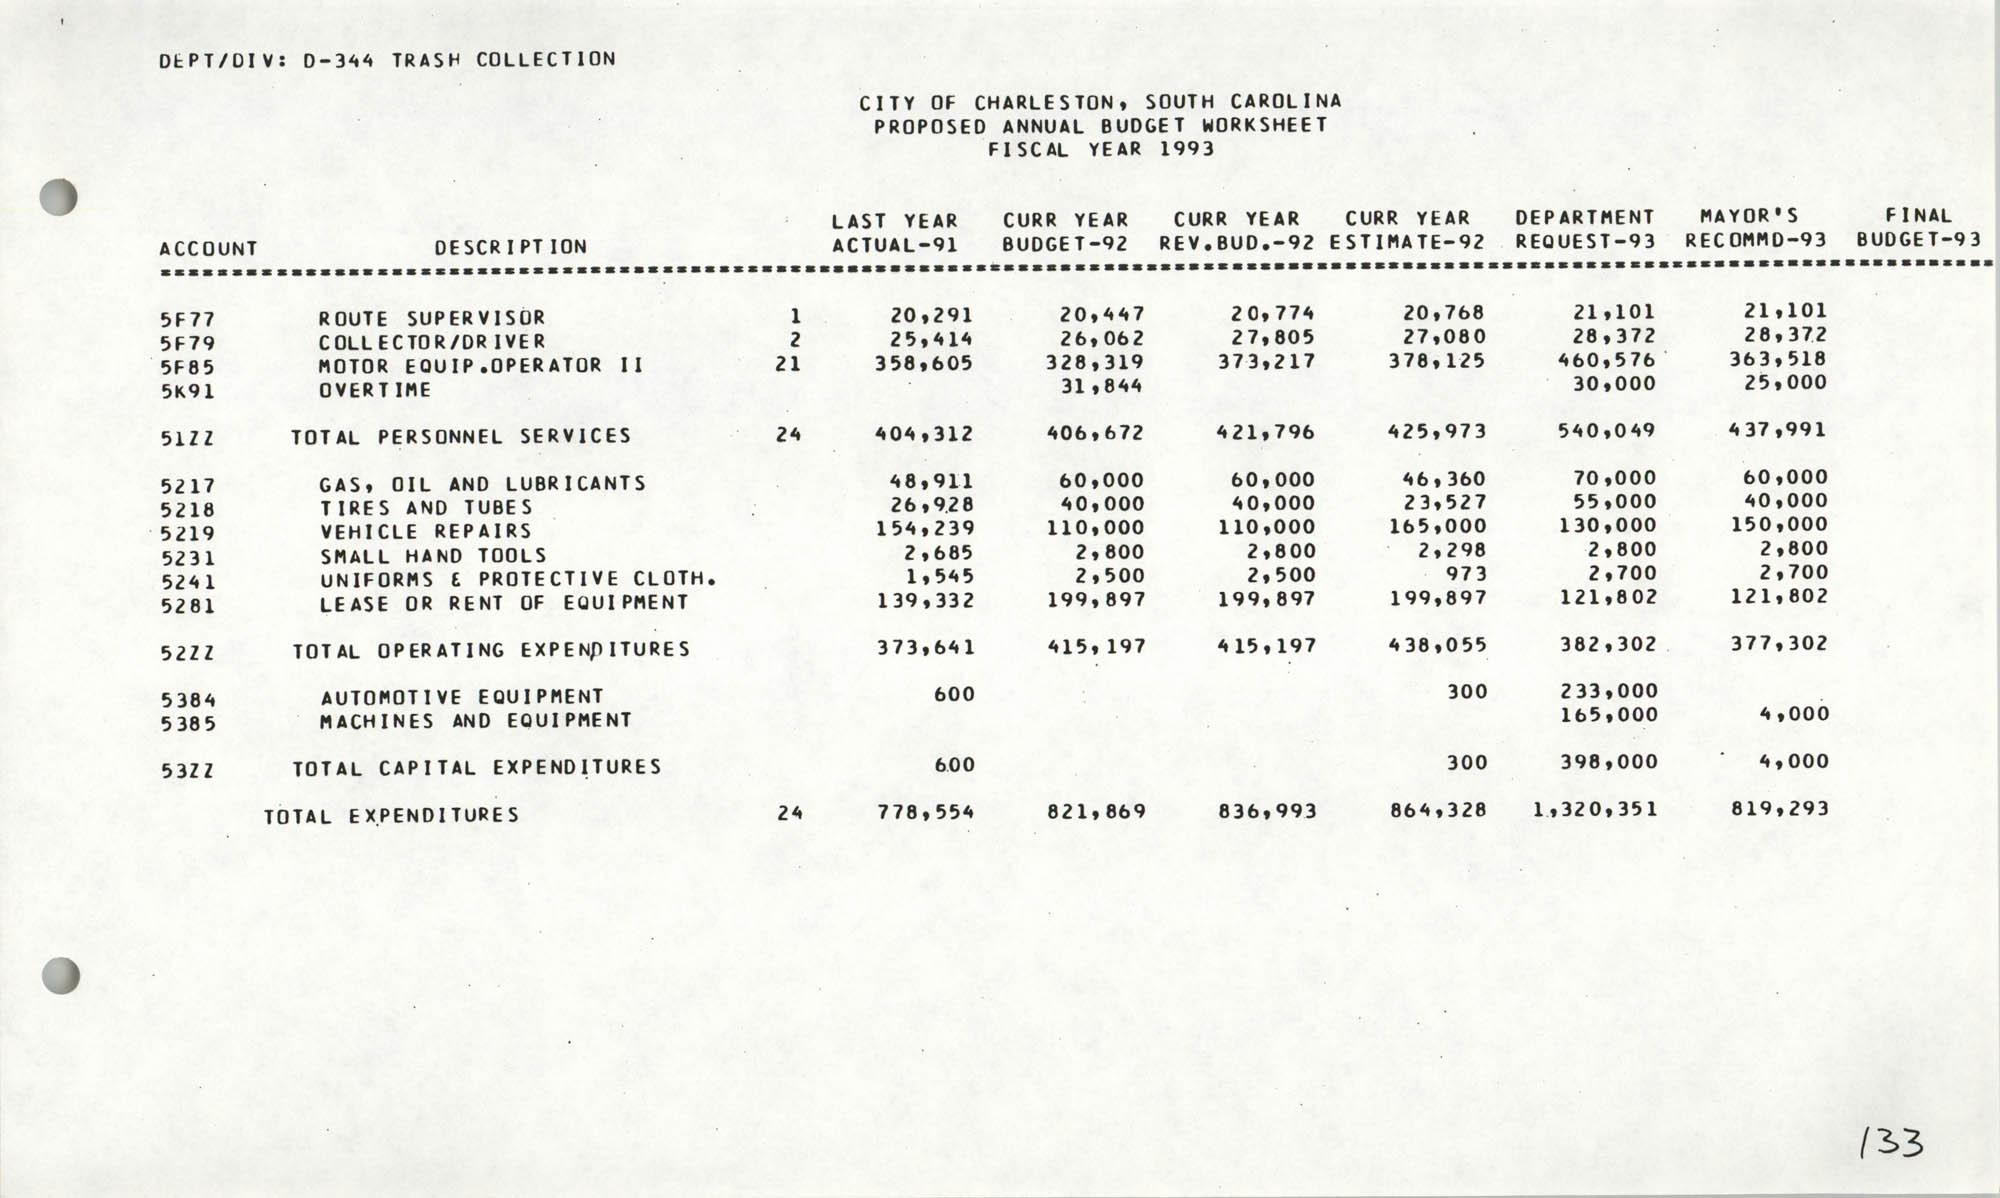 The City Council of Charleston, South Carolina, 1993 Budget, Page 133